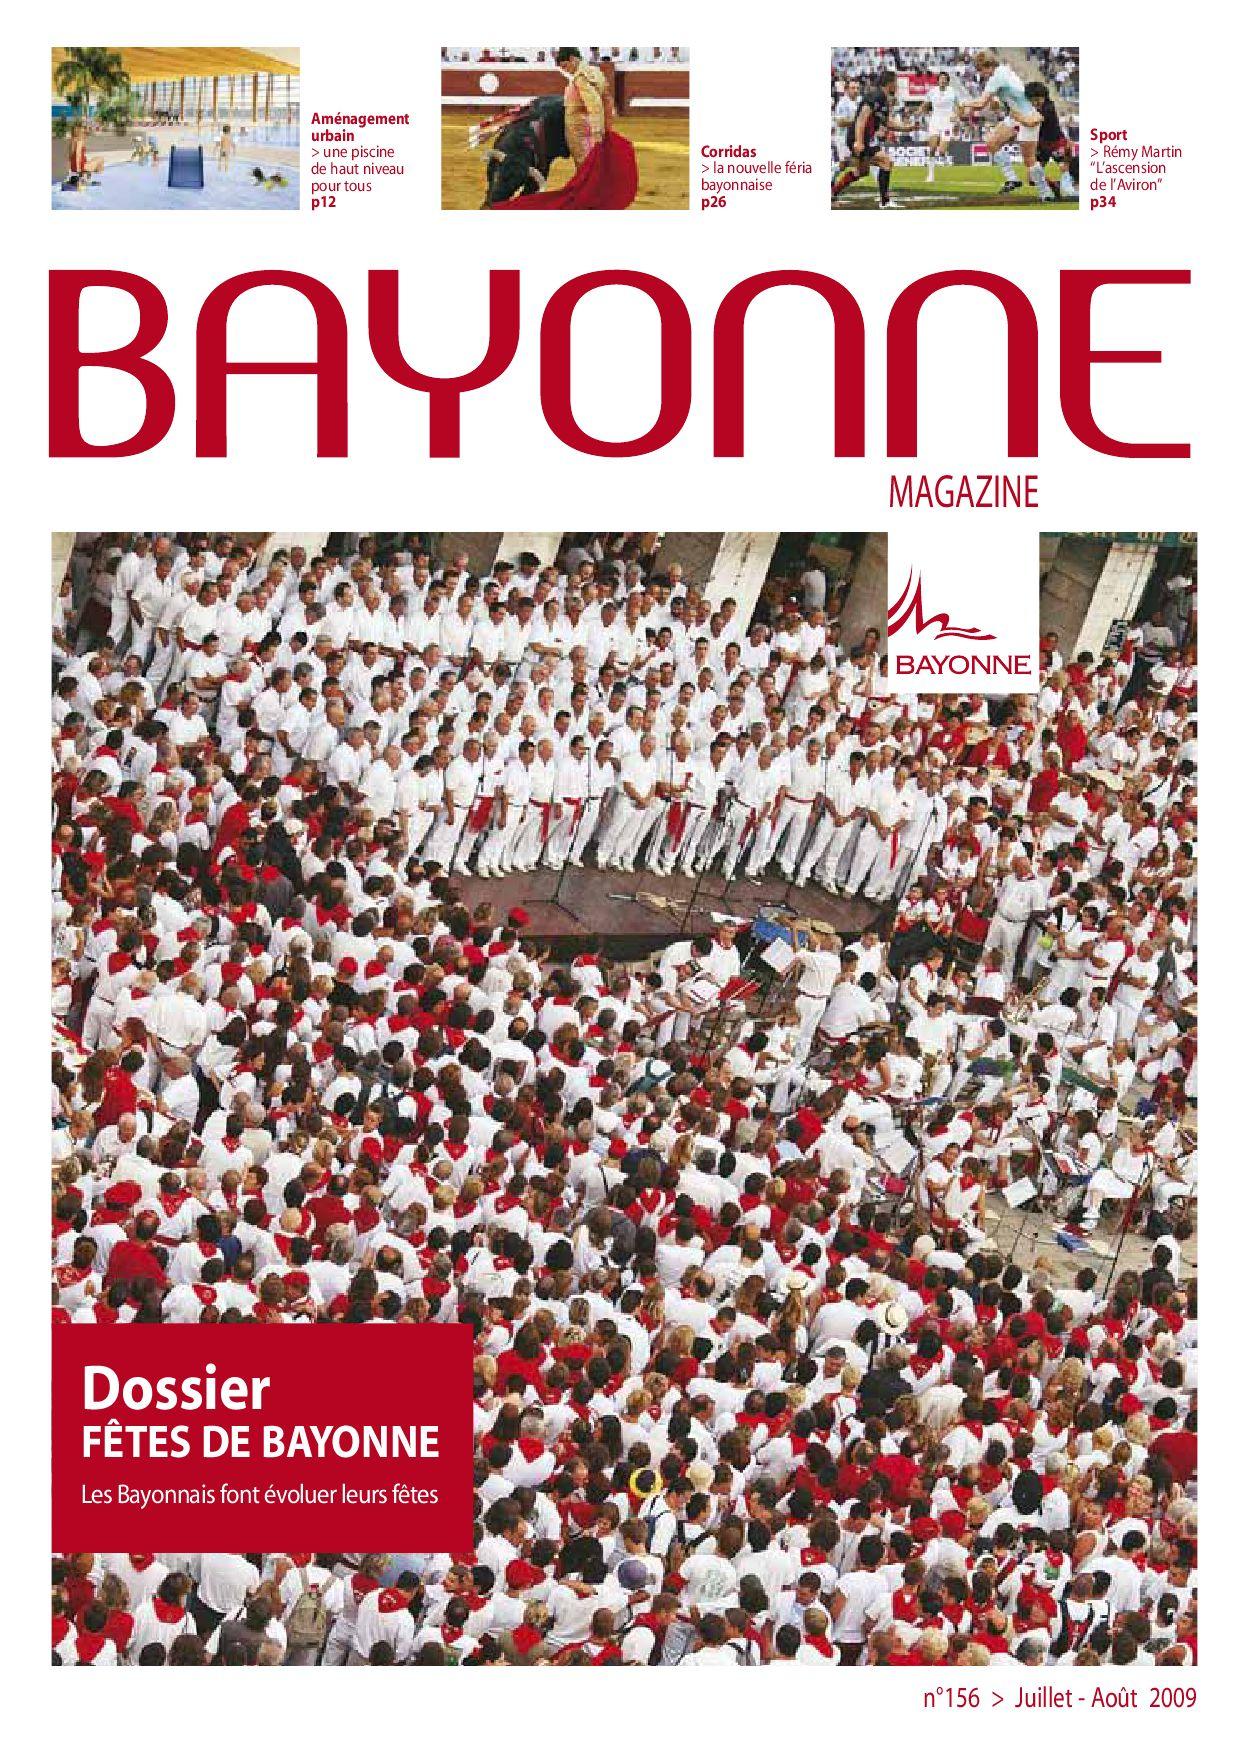 Bayonne Magazine 156 Juillet-Août 2009 By Bayonne - Issuu serapportantà Centre Aquatique Des Hauts De Bayonne Piscine Bayonne